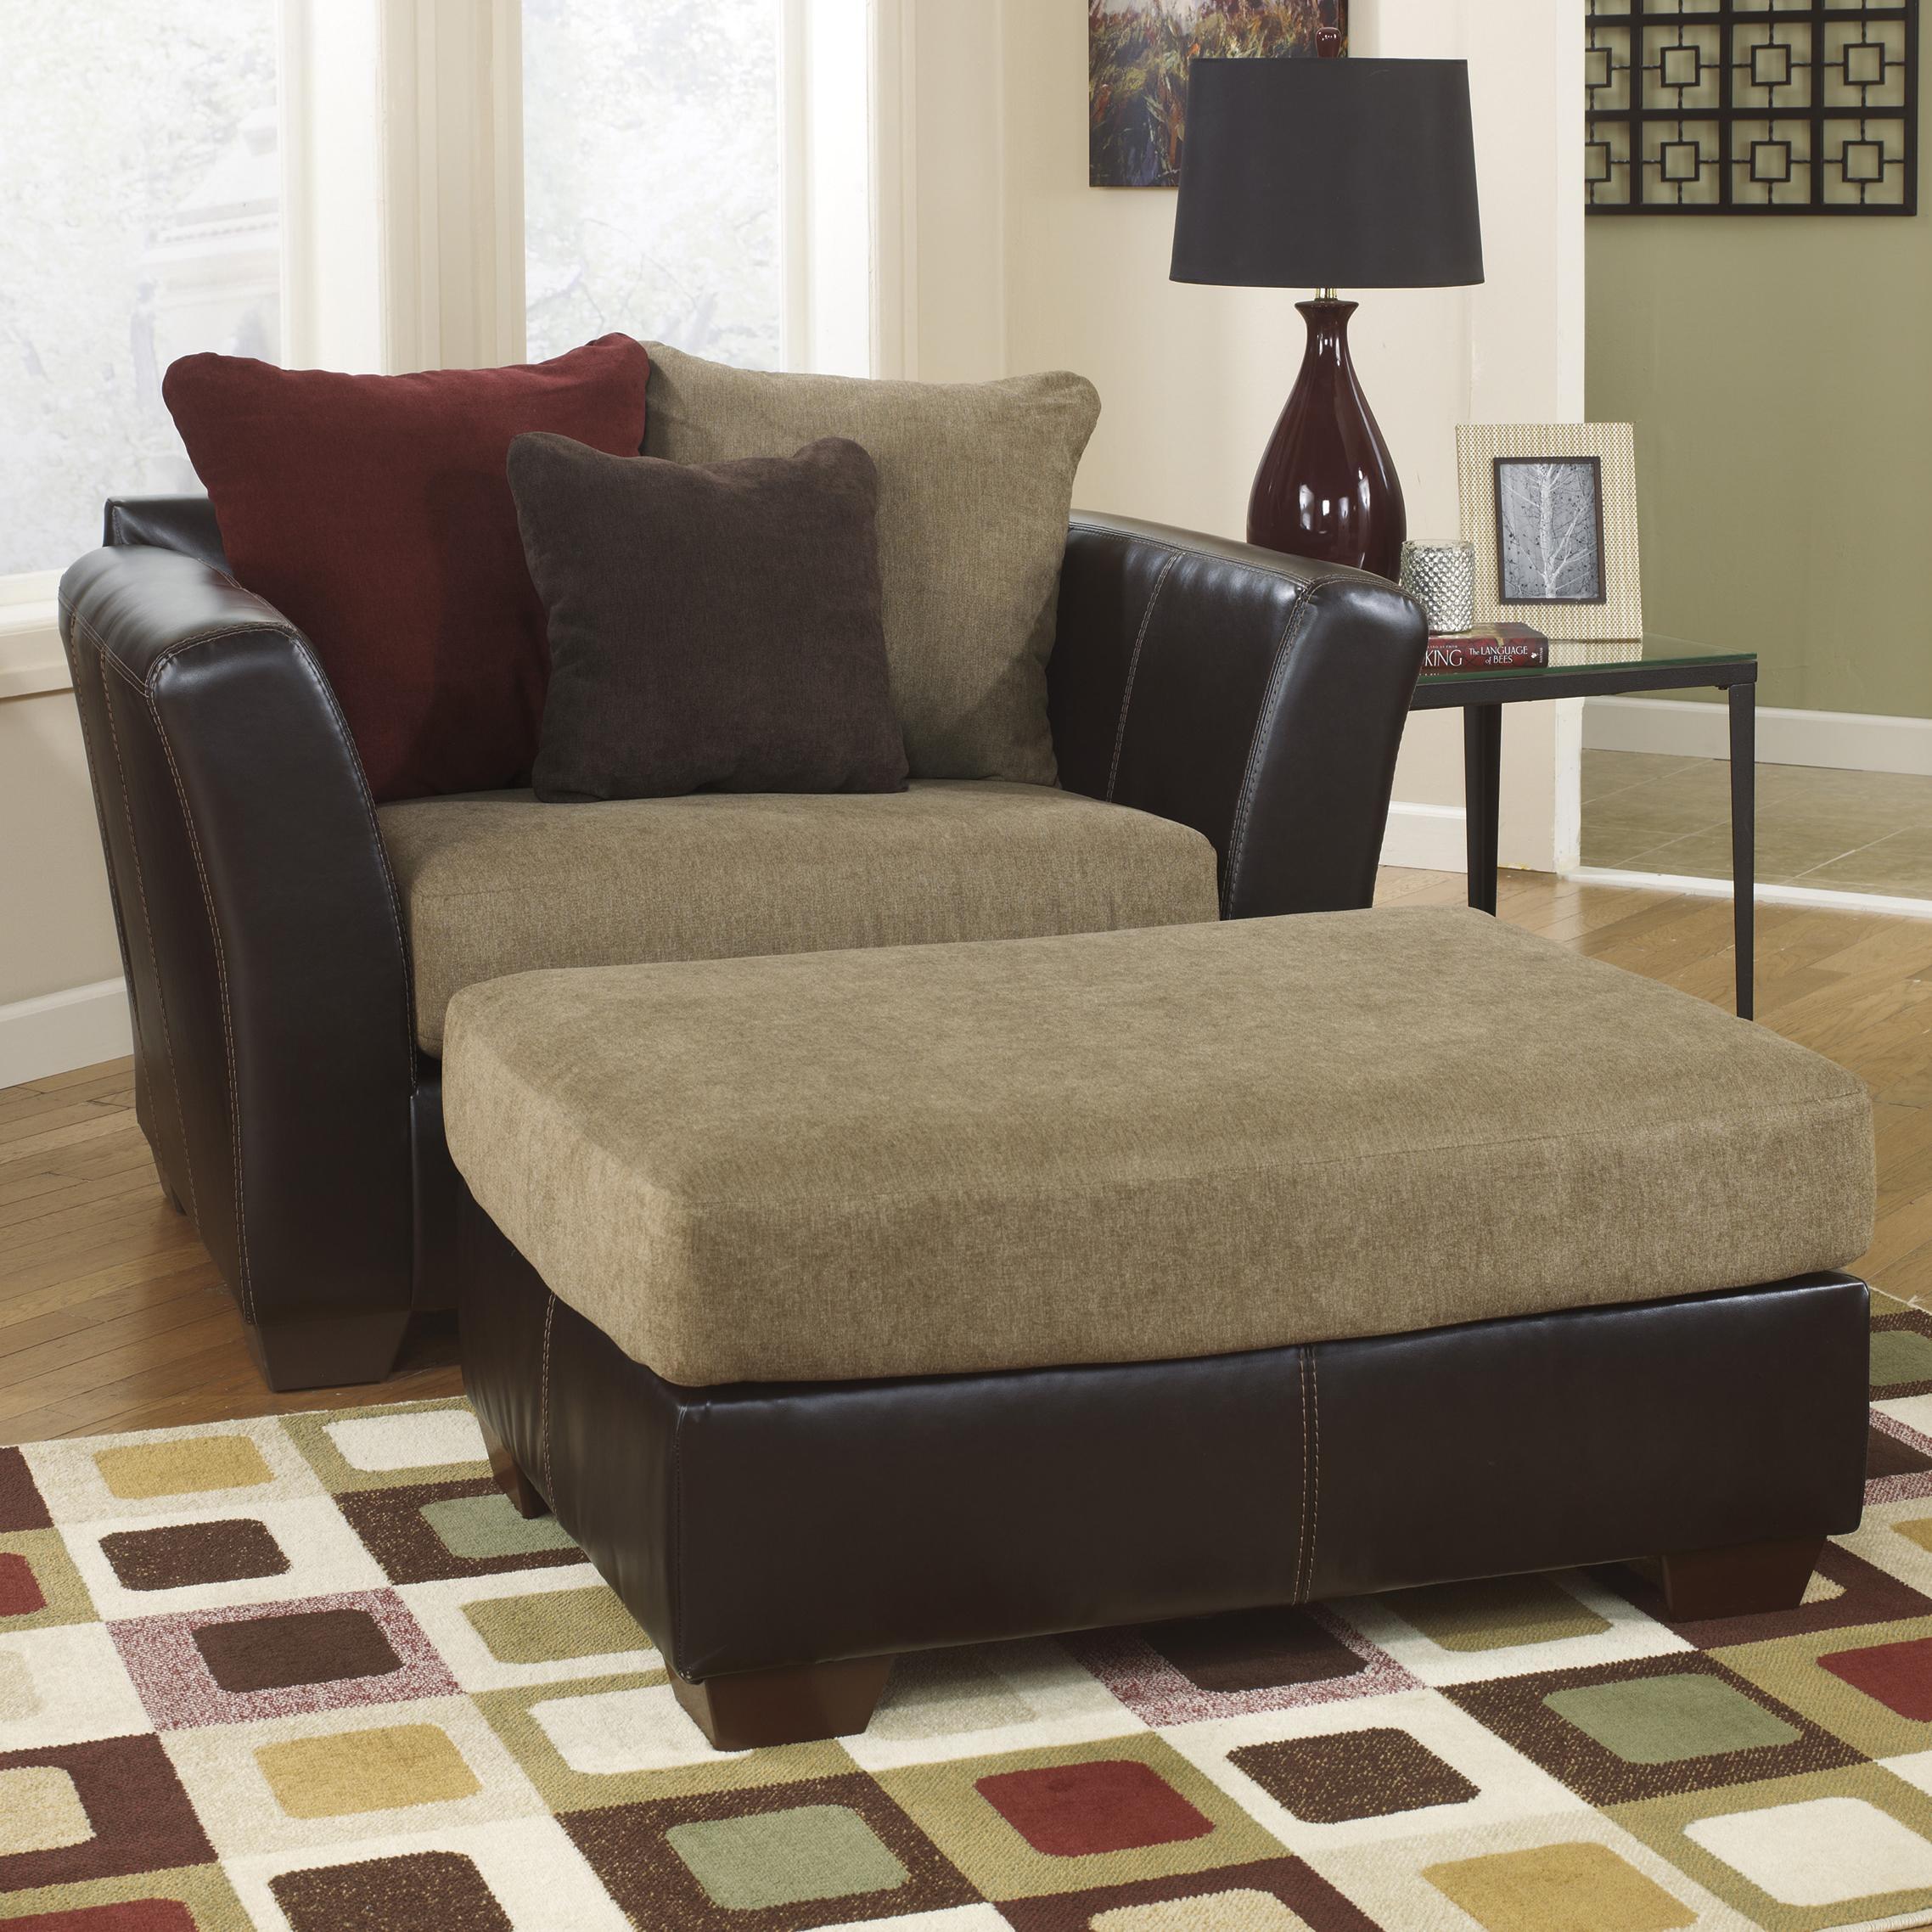 Ashley Furniture Sanya - Mocha Chair and a Half & Ottoman - Item Number: 2840023+08